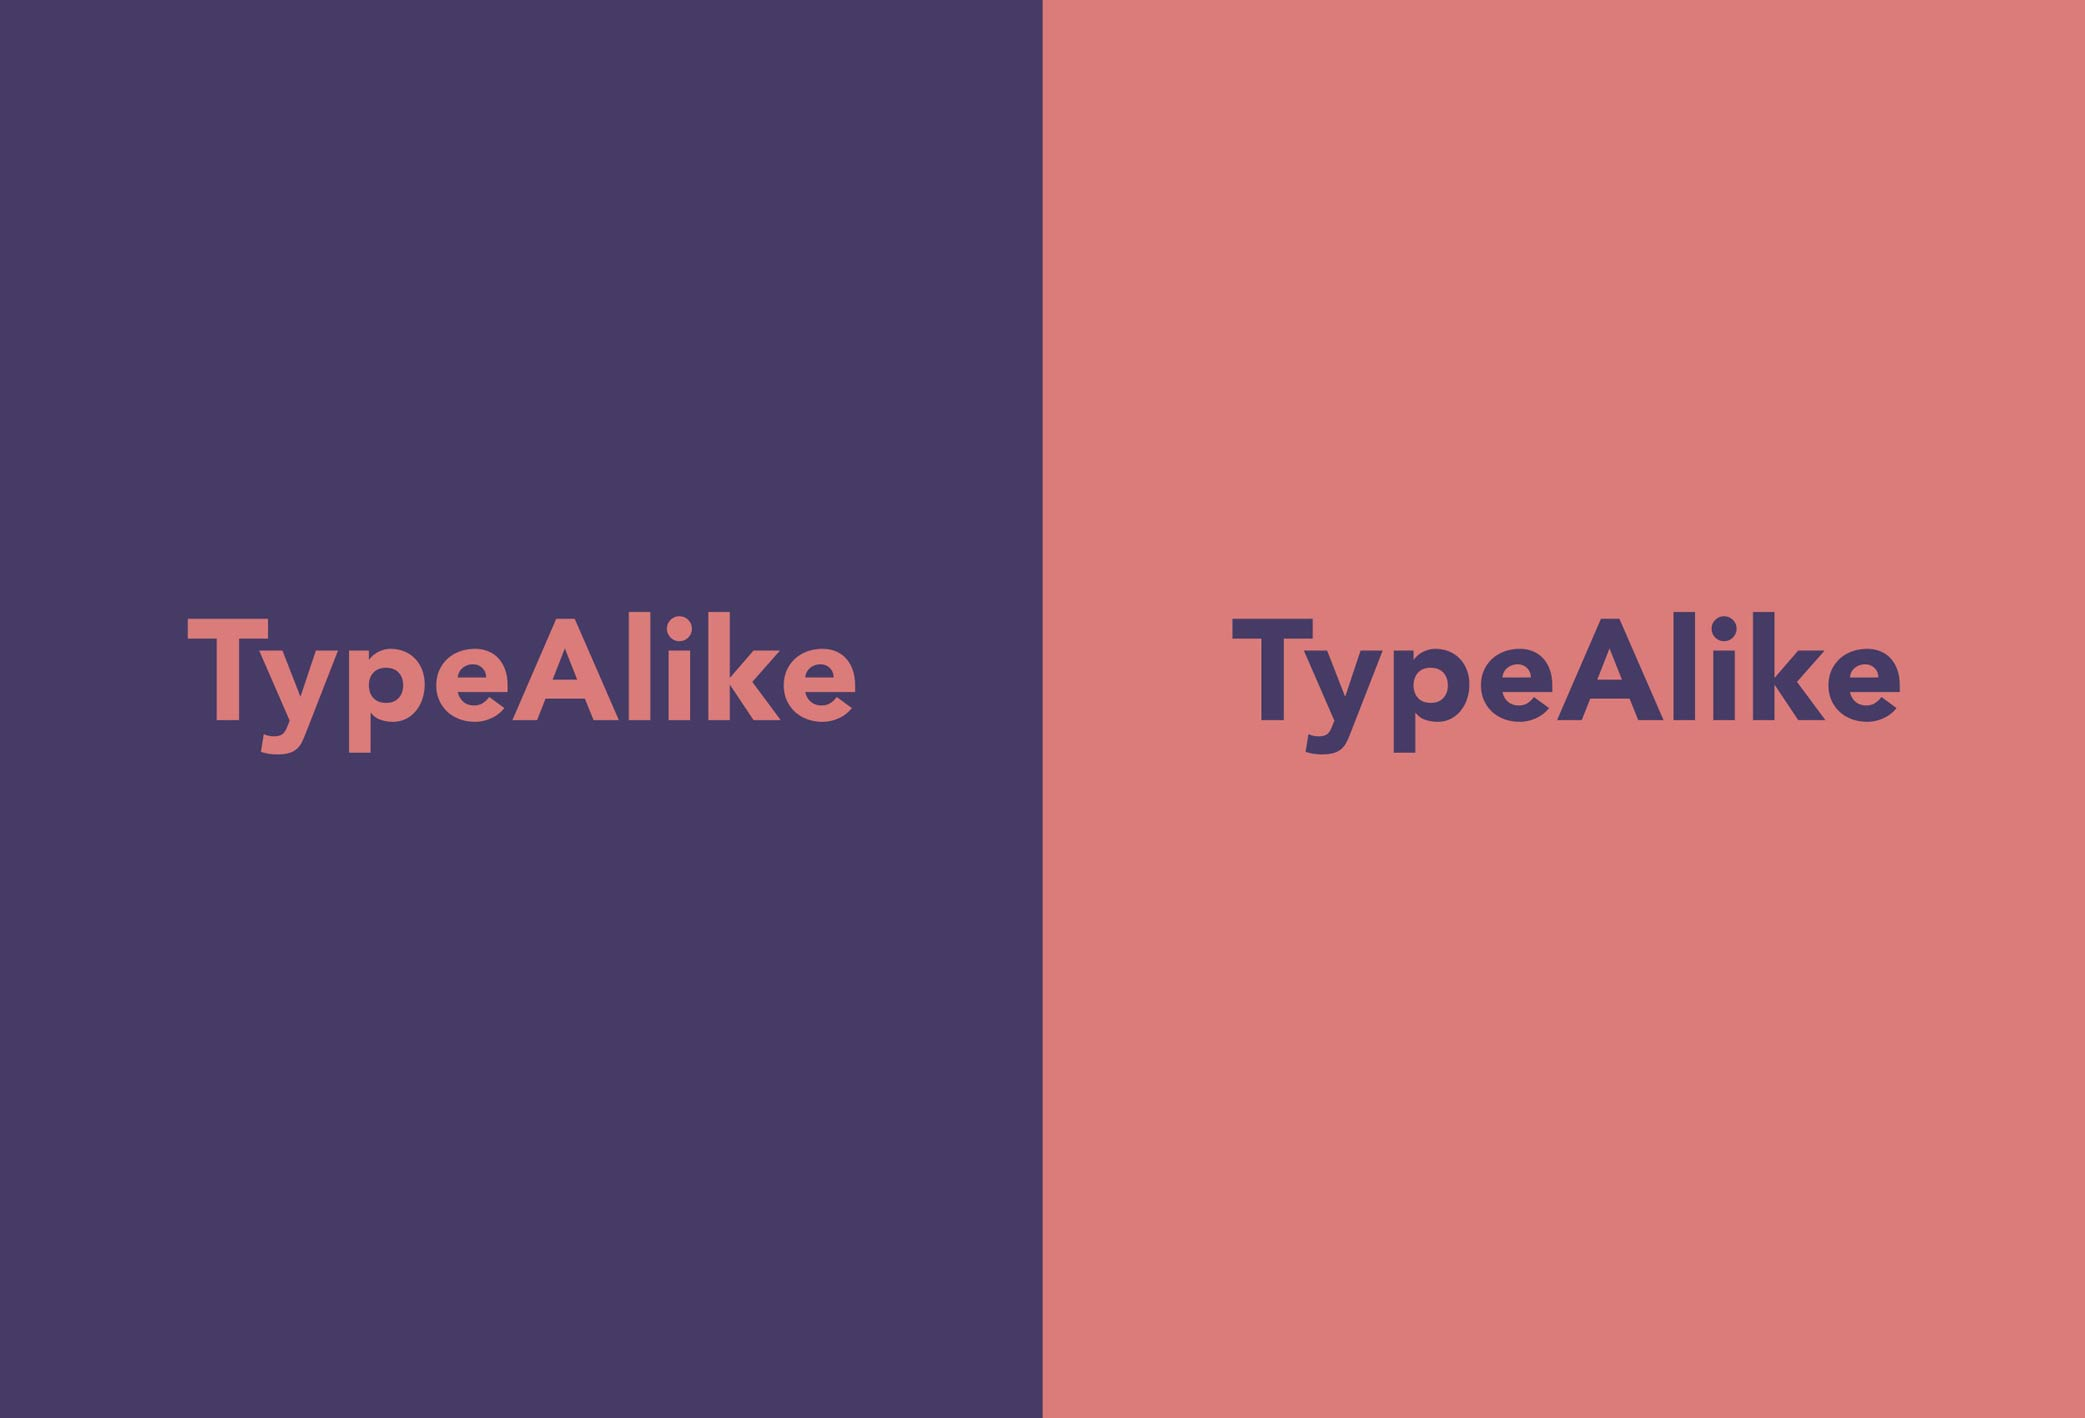 type alike brand identity